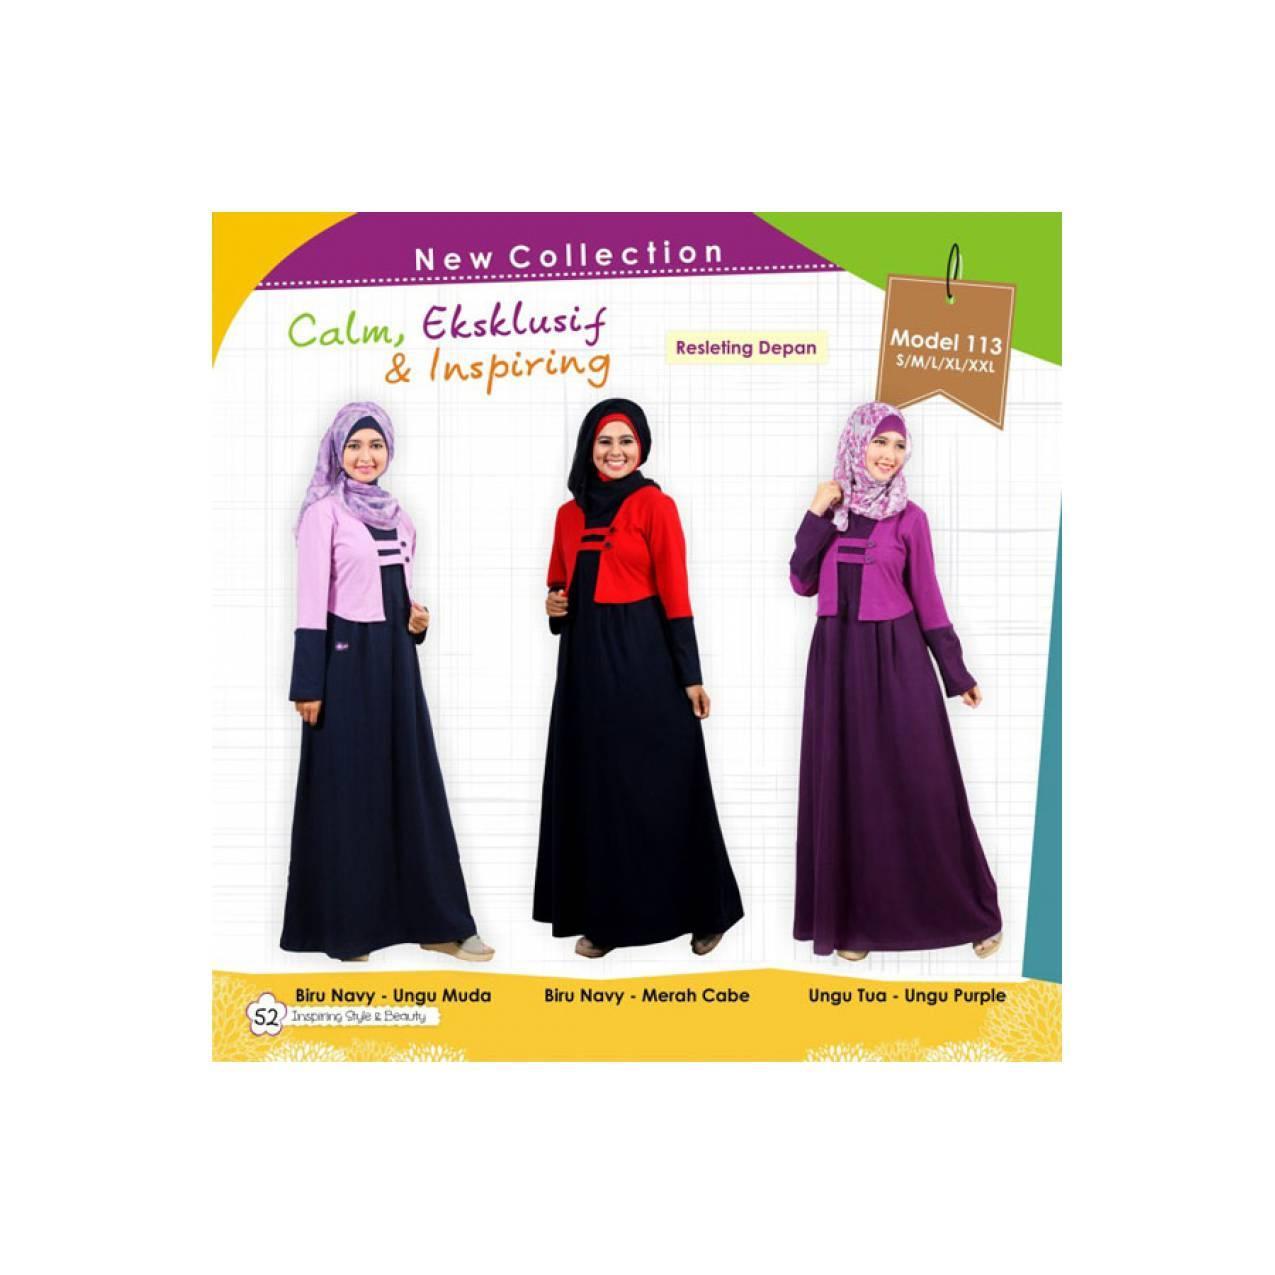 Baju Muslimah Gamis Murah Bahan Kaos ORI MUTIF - Model 113